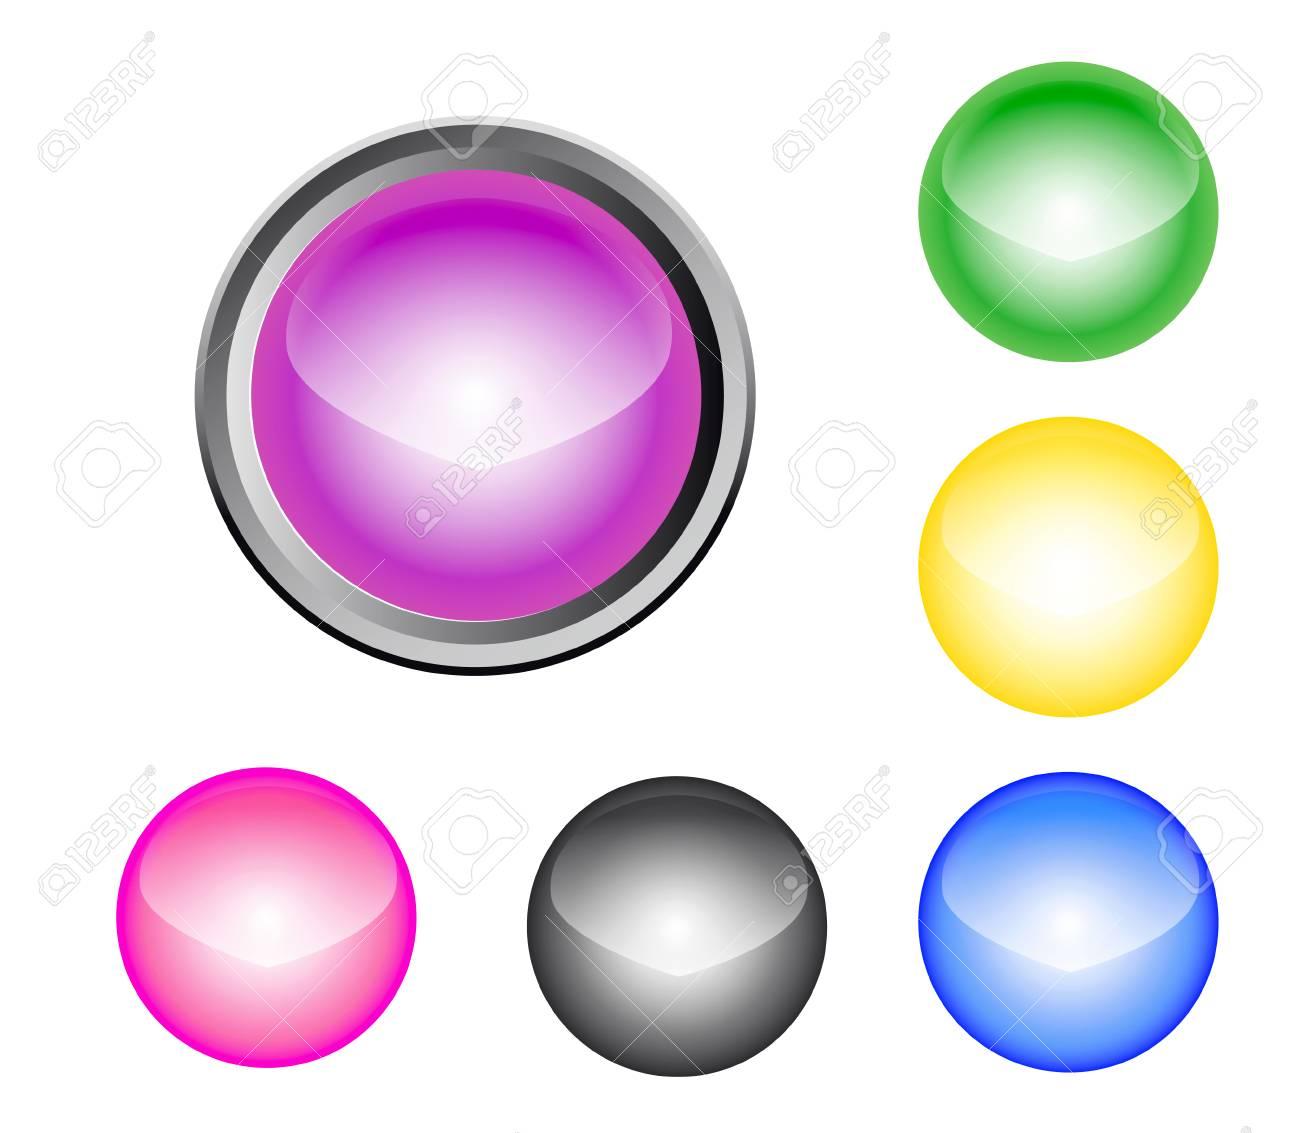 Metalic Glossy Button Stock Vector - 6746590